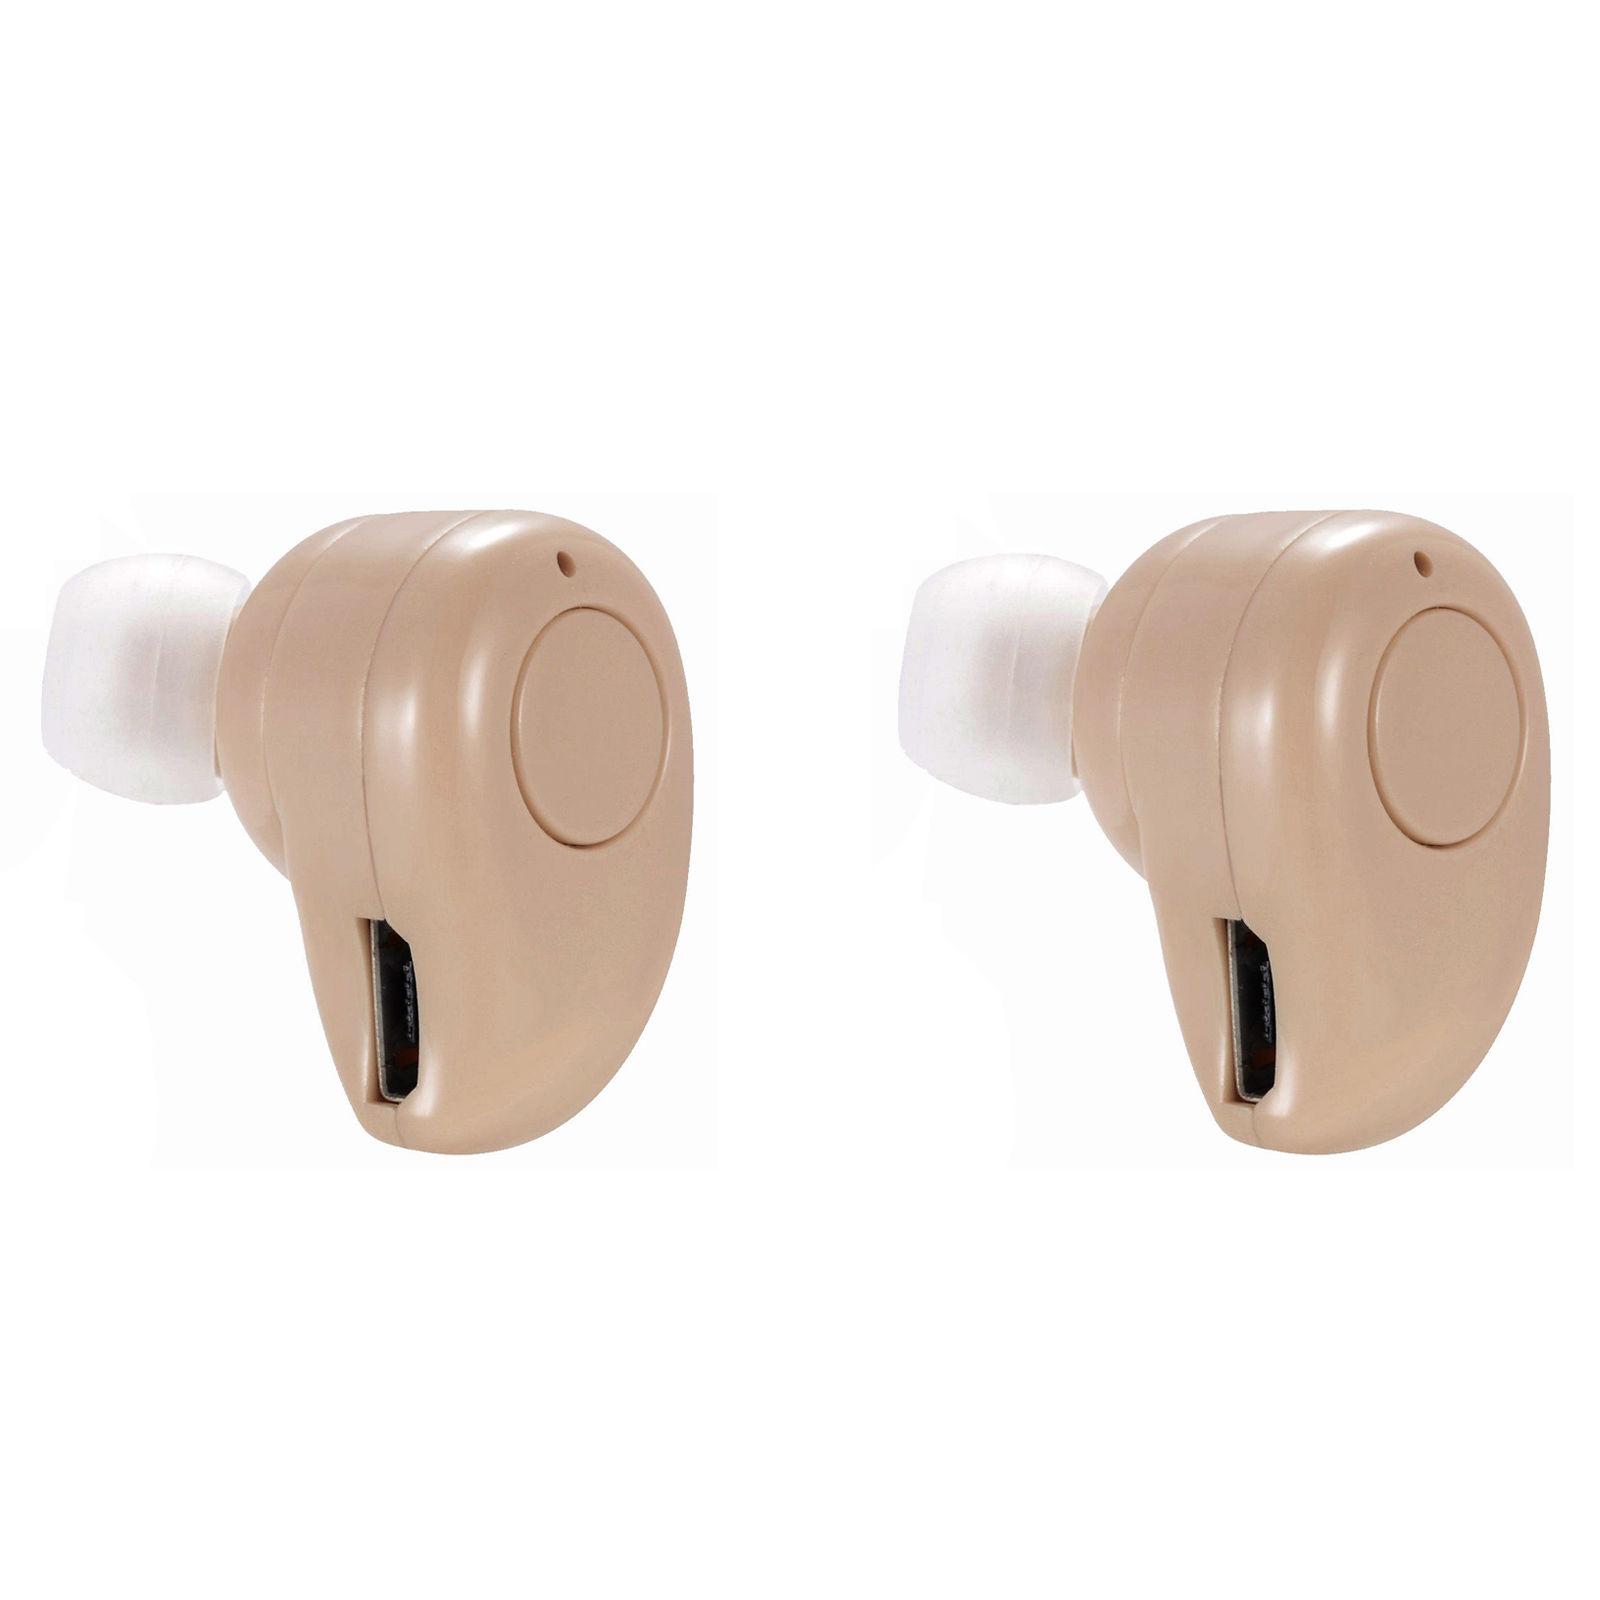 Mini Wireless Bluetooth In-Ear Headset Earbud Stereo Earphone For Samsung iPhone